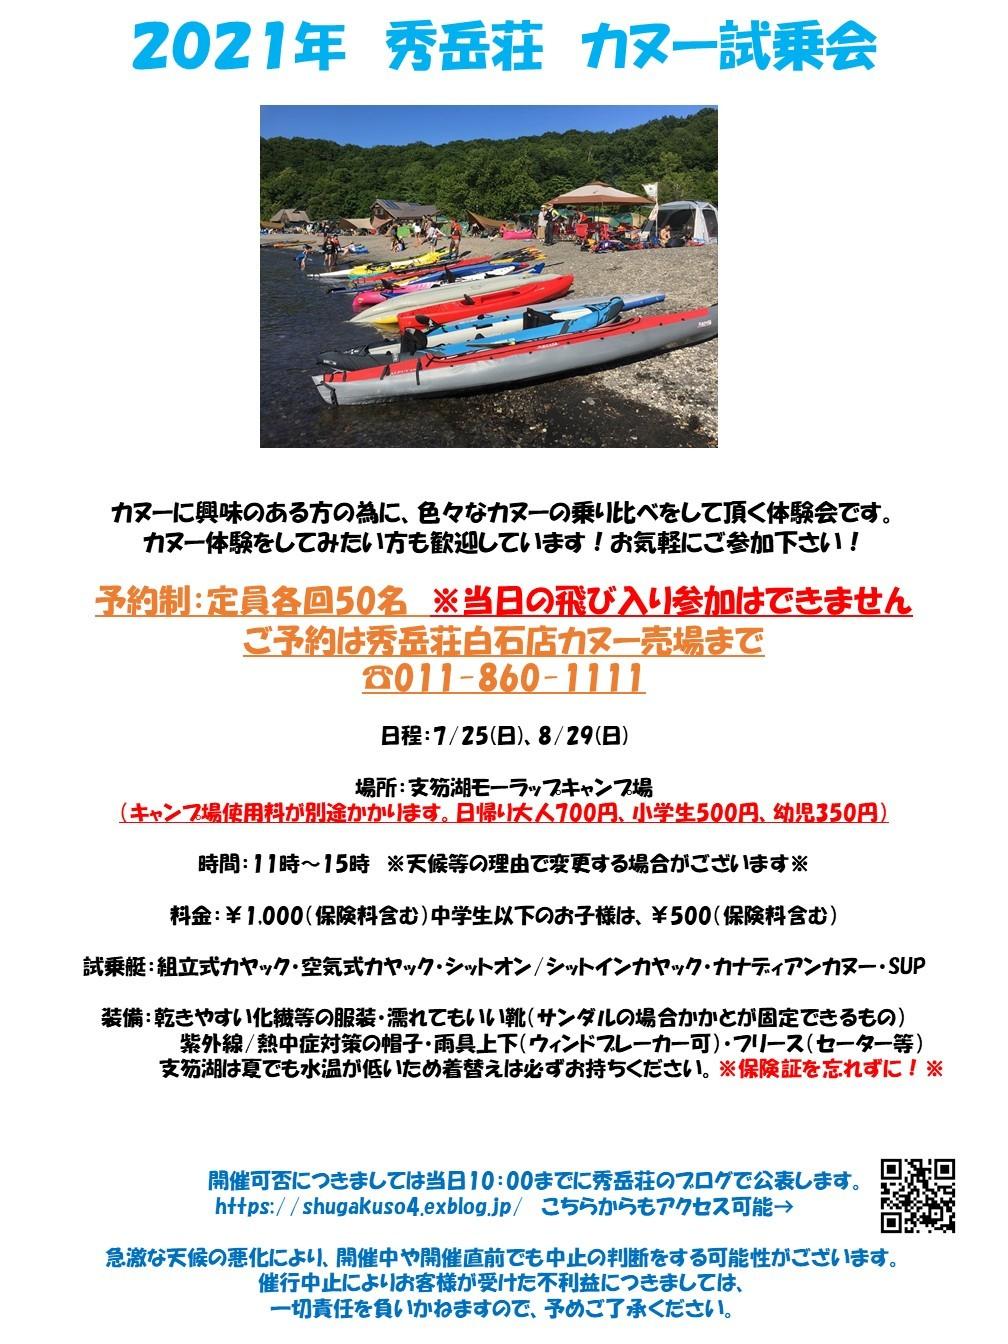 2021年 カヌー試乗会_d0198793_15560419.jpg